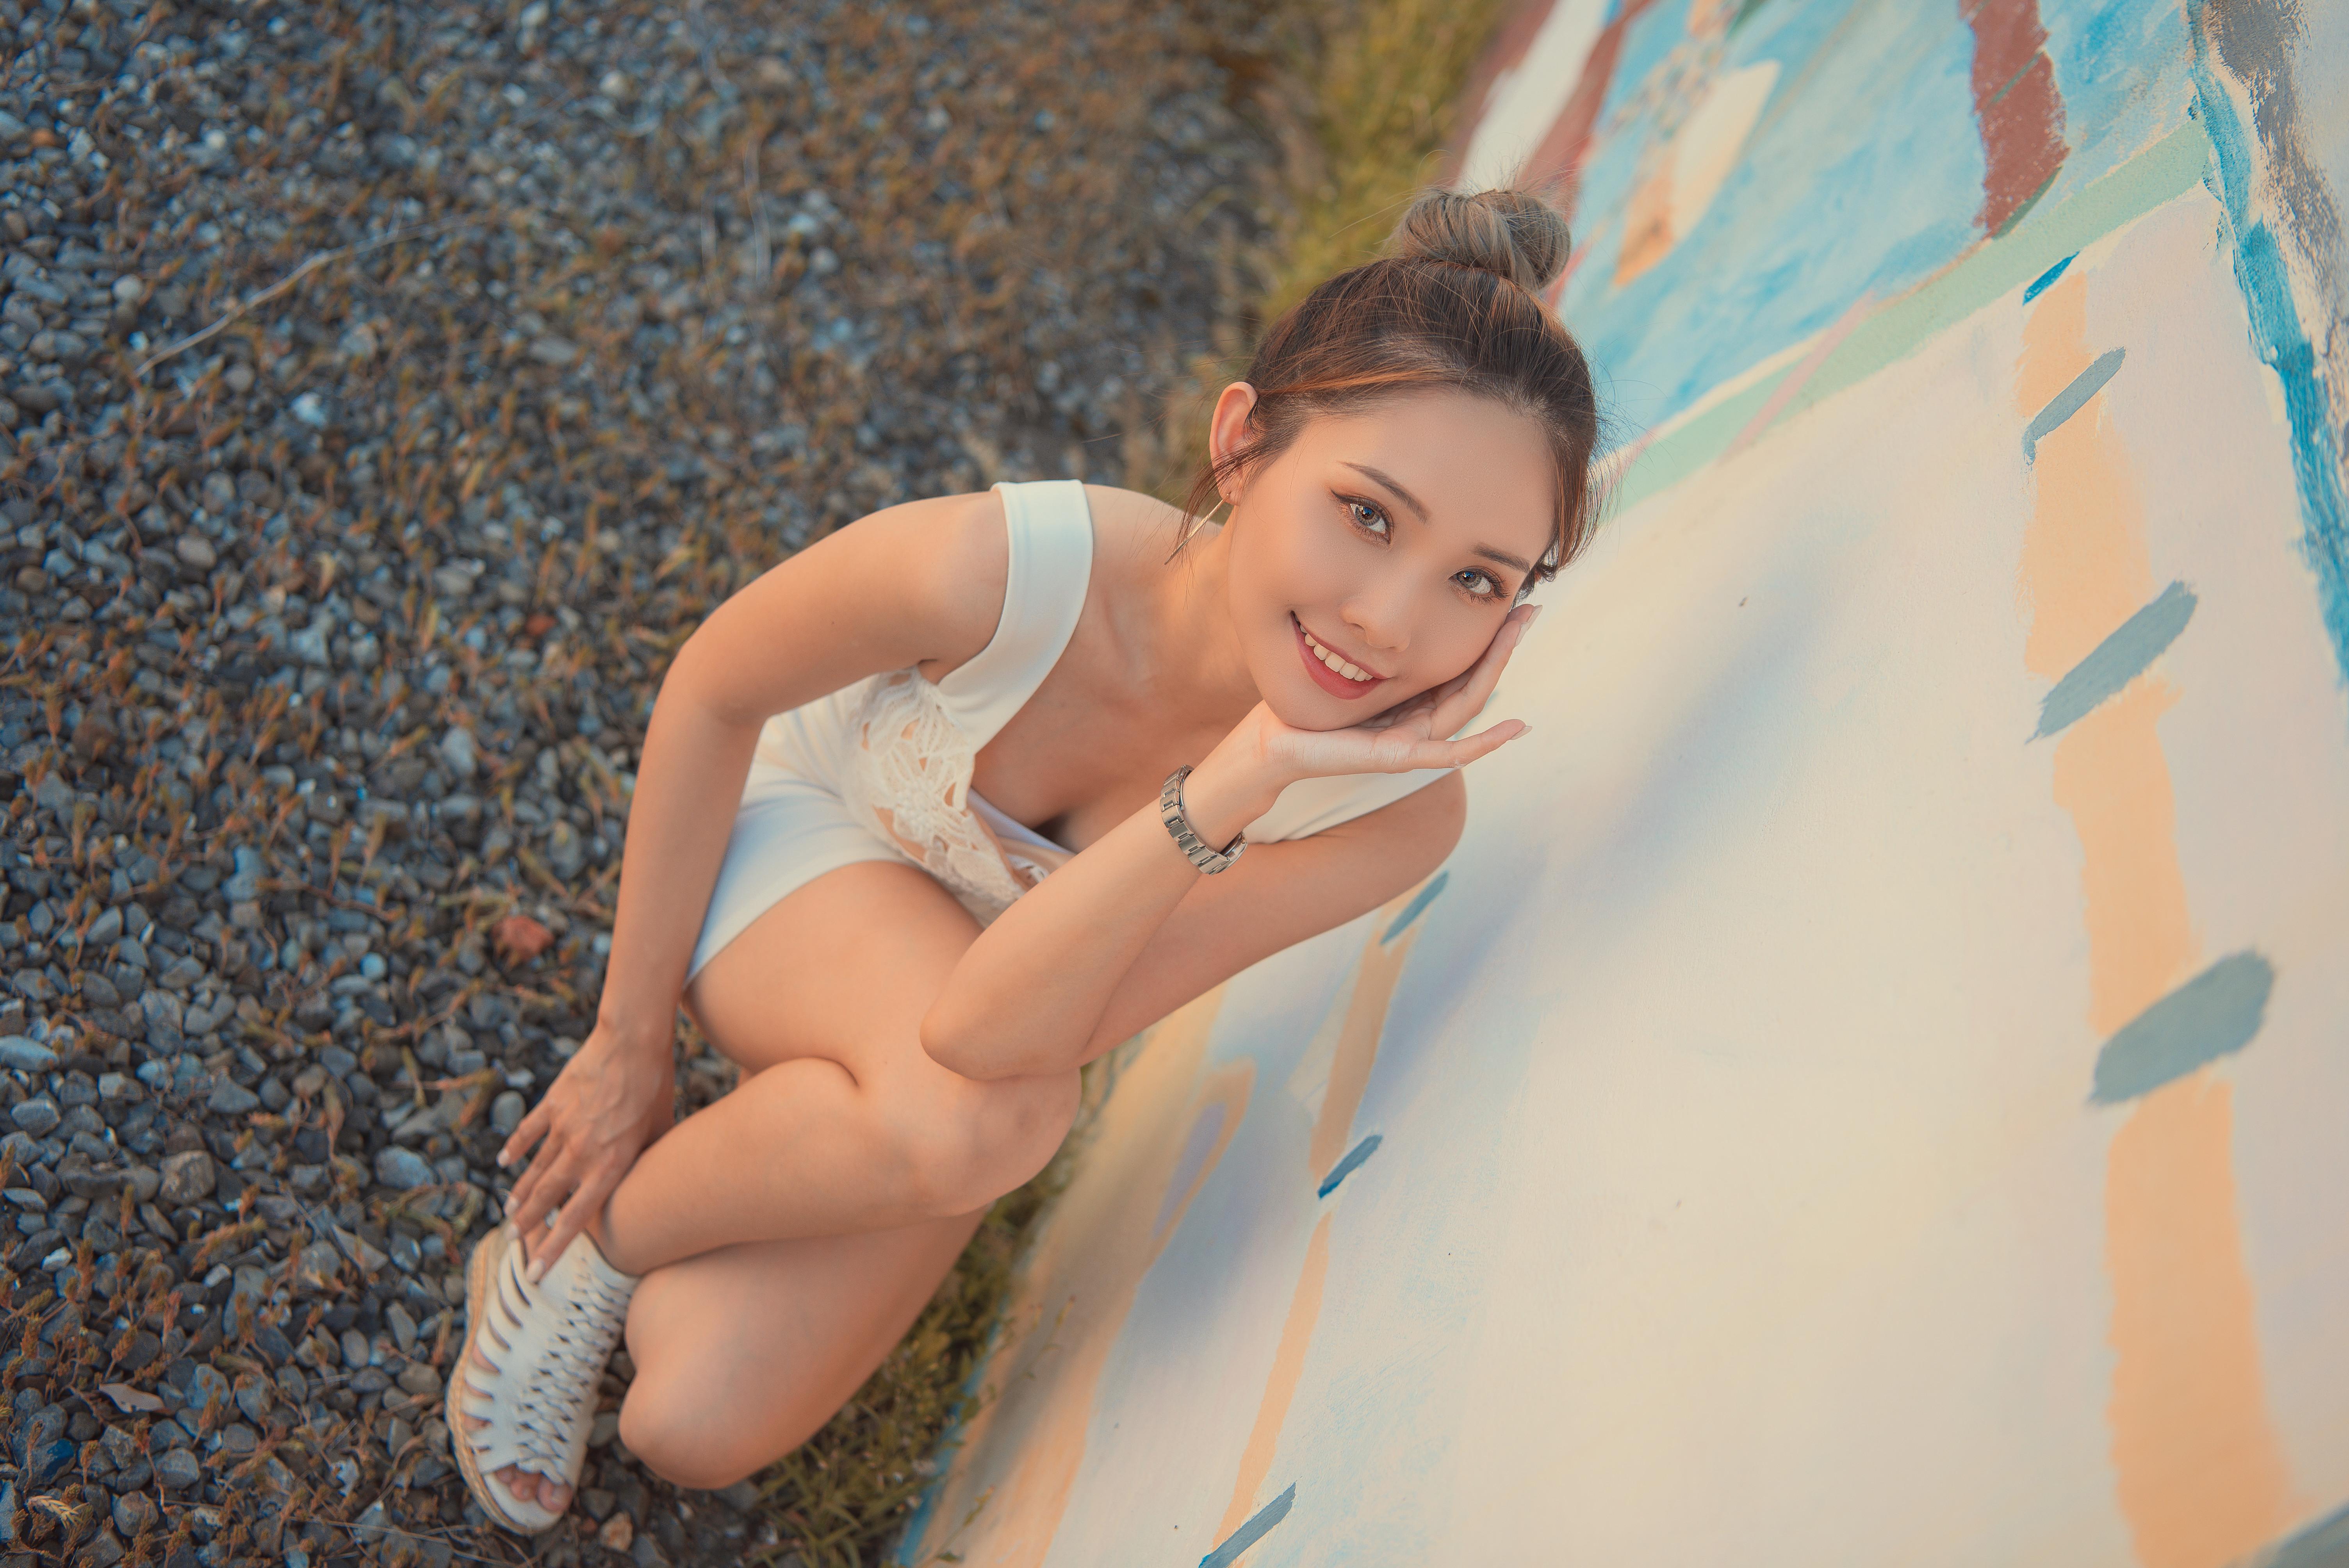 People 6016x4016 Asian women model long hair brunette kneeling white shirt shorts wristwatch sandals wall